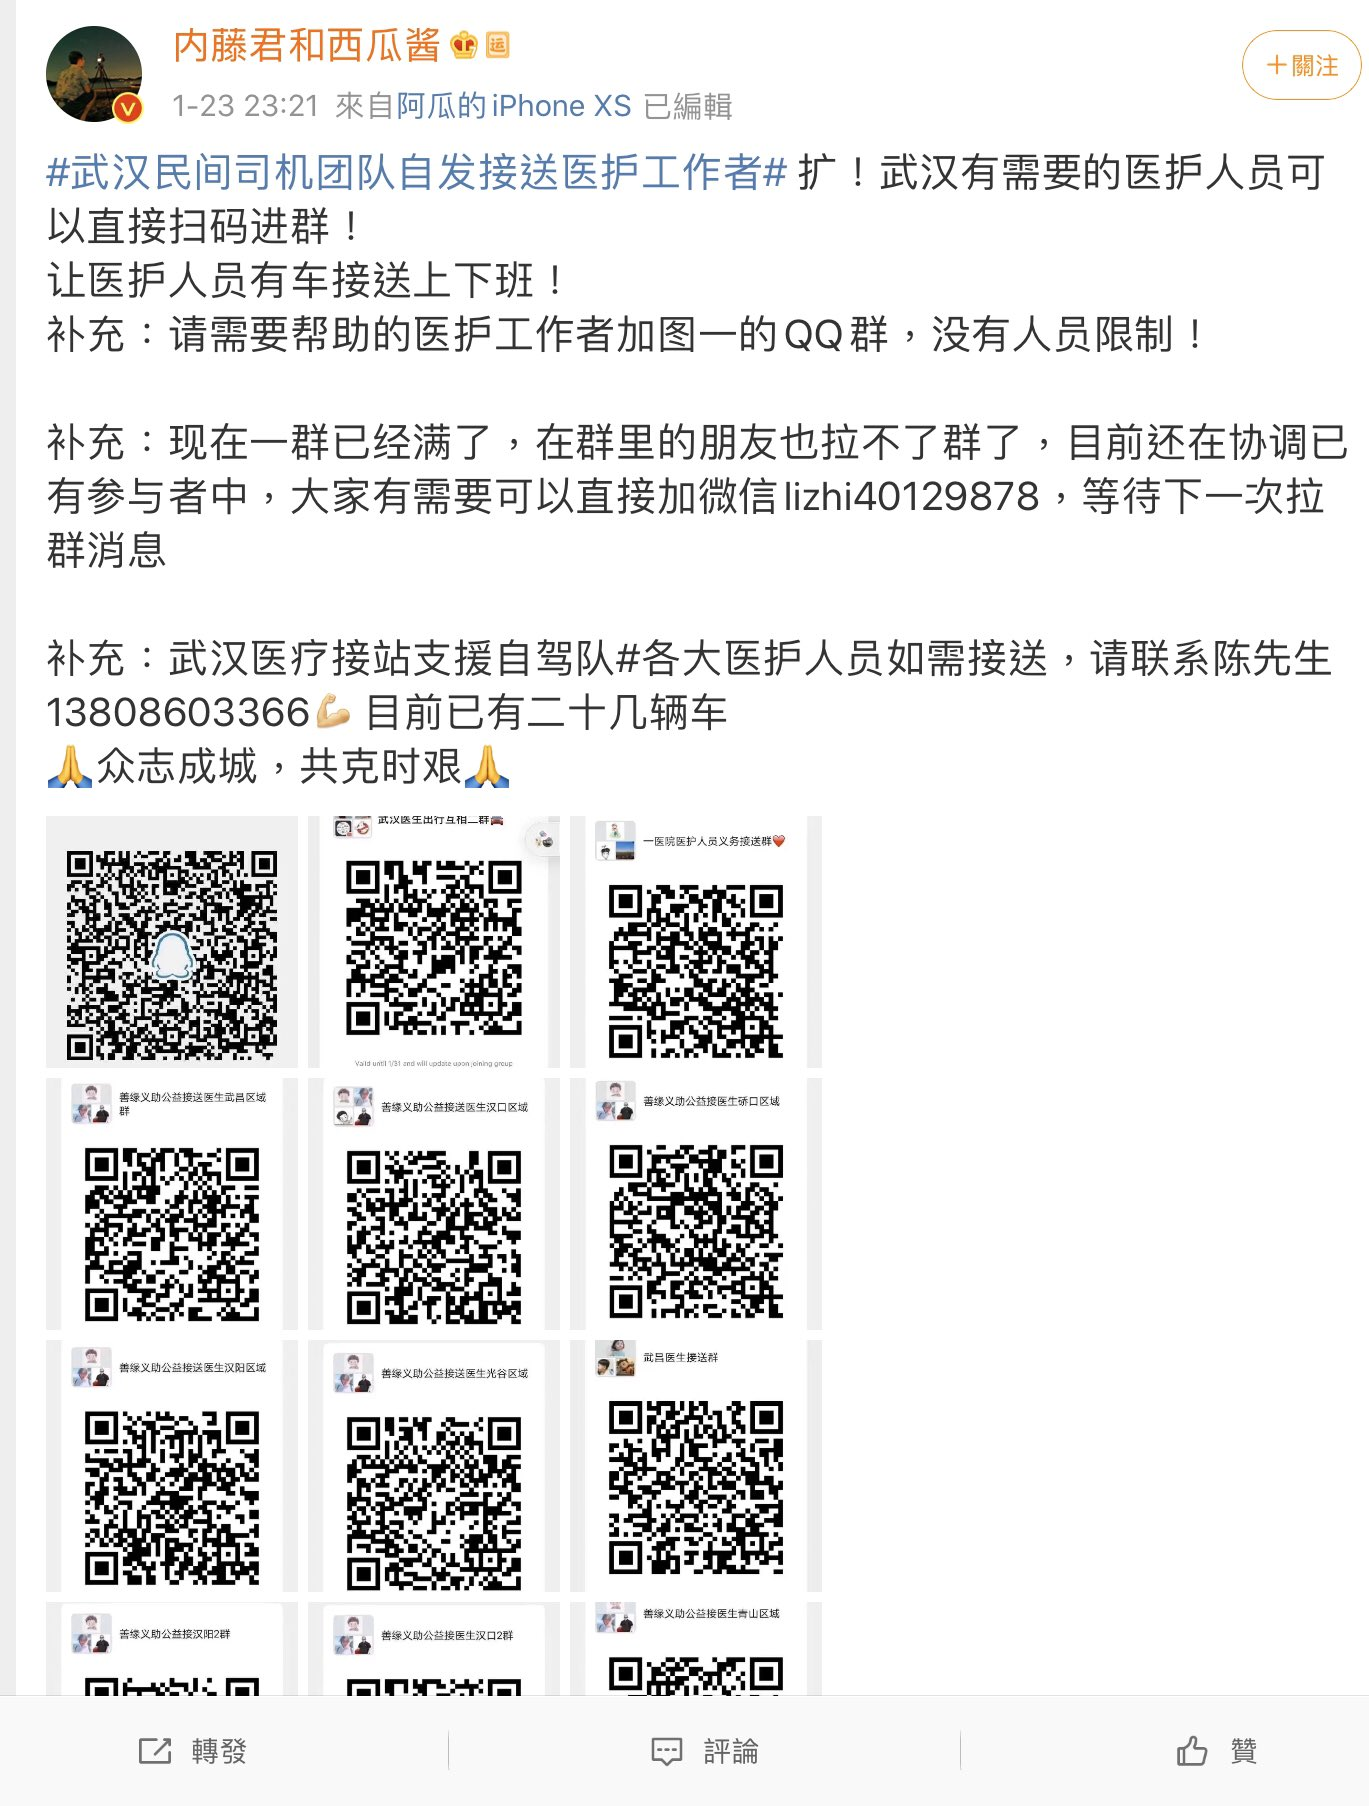 https://pbs.twimg.com/media/EPB461UW4AAc-BC?format=jpg&name=orig